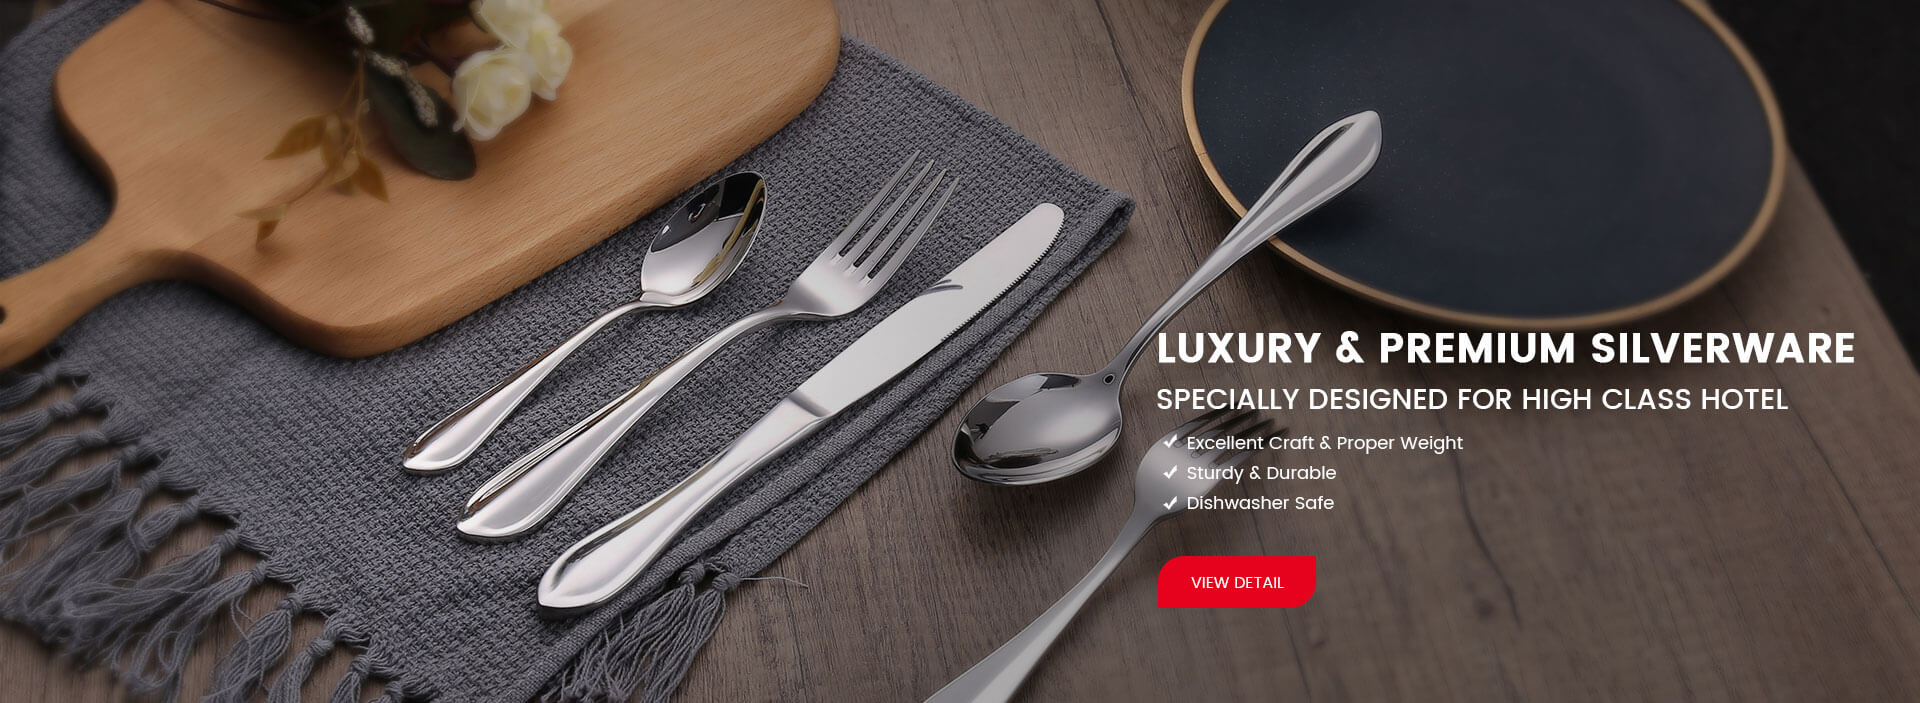 Luxury & Premium Silverware